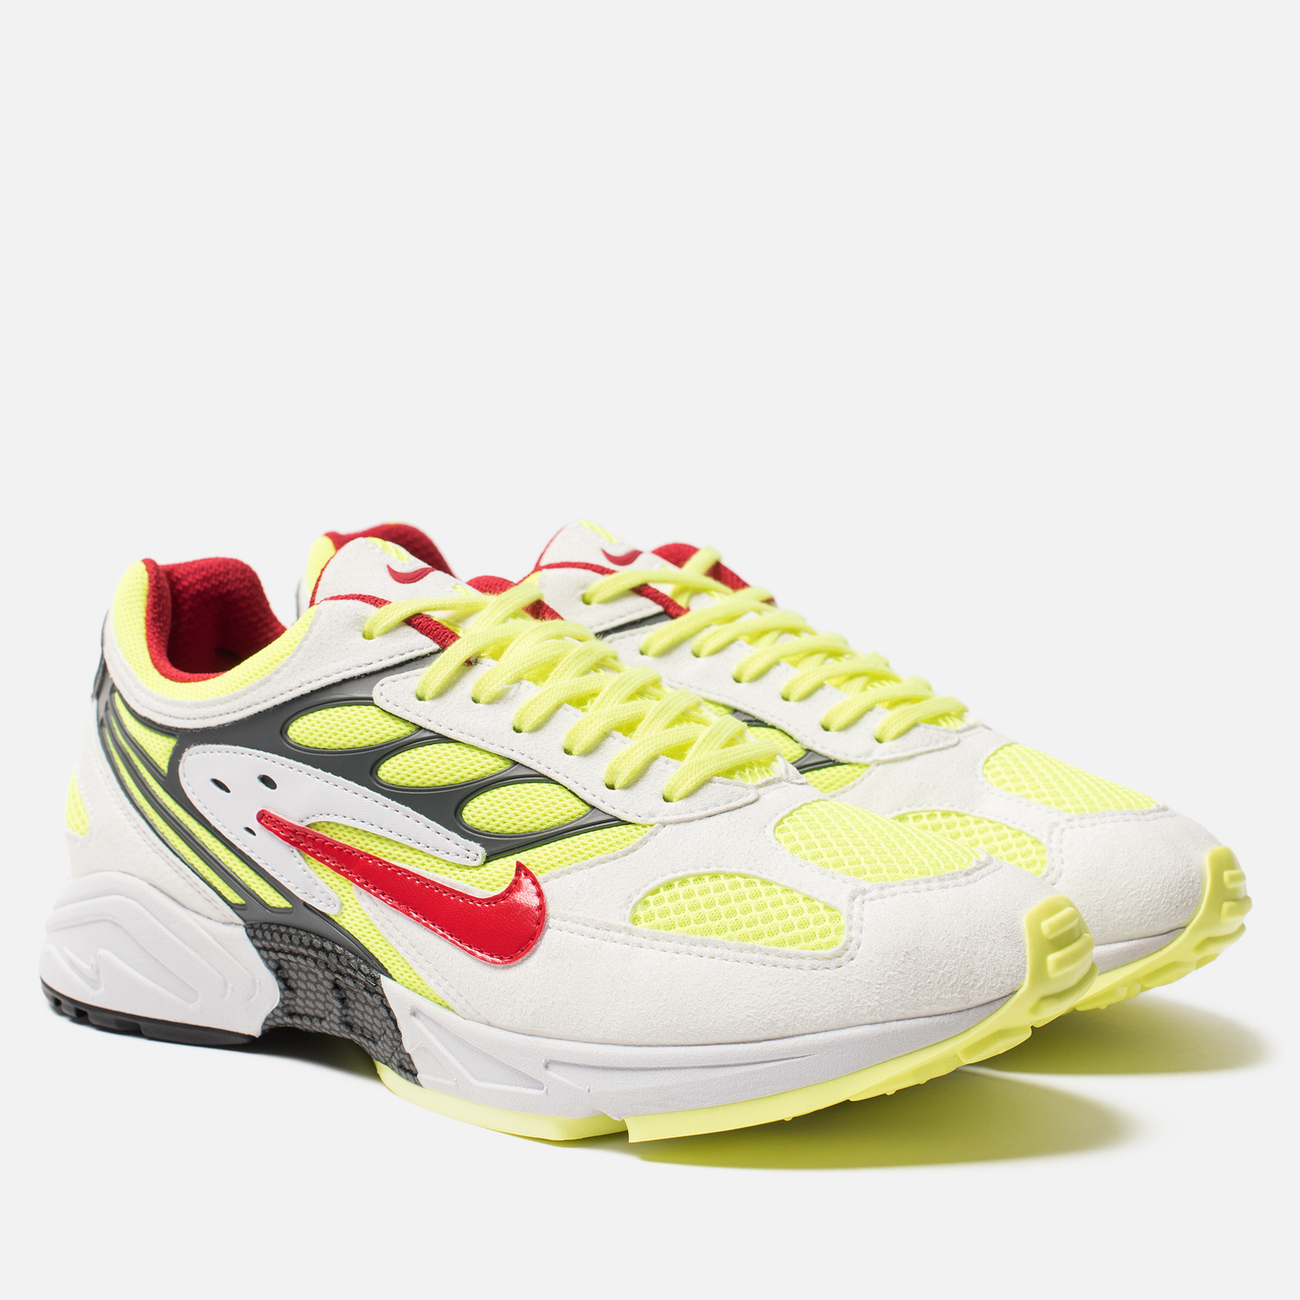 Кроссовки Nike Air Ghost Racer White/Atom Red/Neon Yellow/Dark Grey